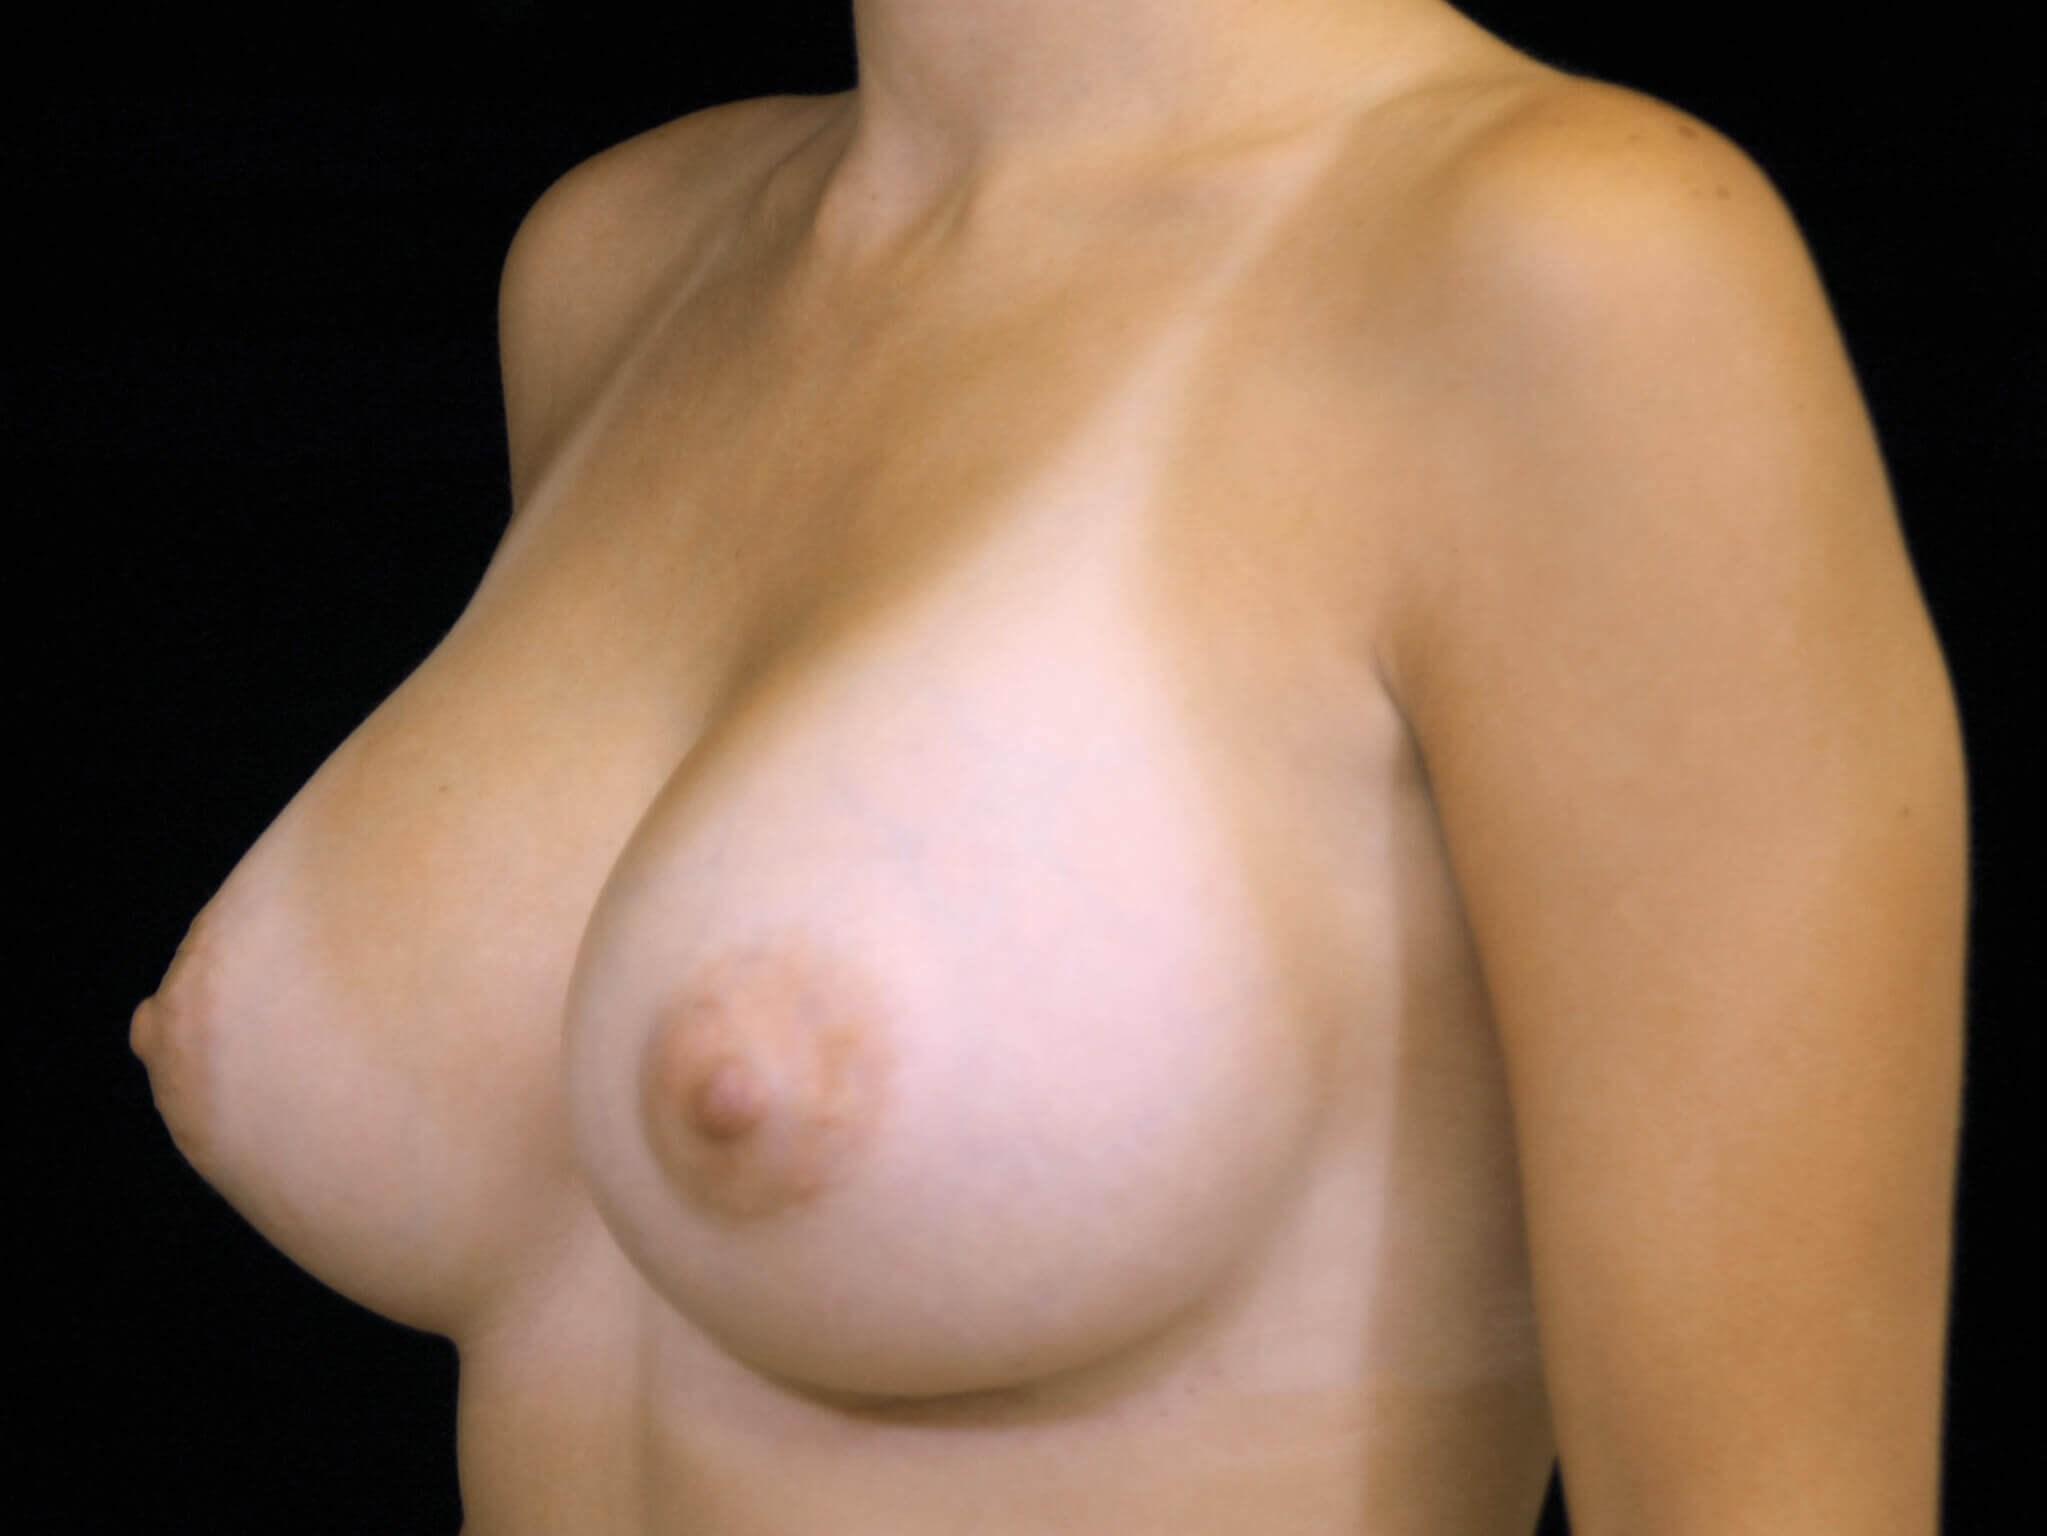 DALLAS, TEXAS MOM HAS BREAST AUGMENTATION WITH SILICONE GEL BREAST IMPLANTS